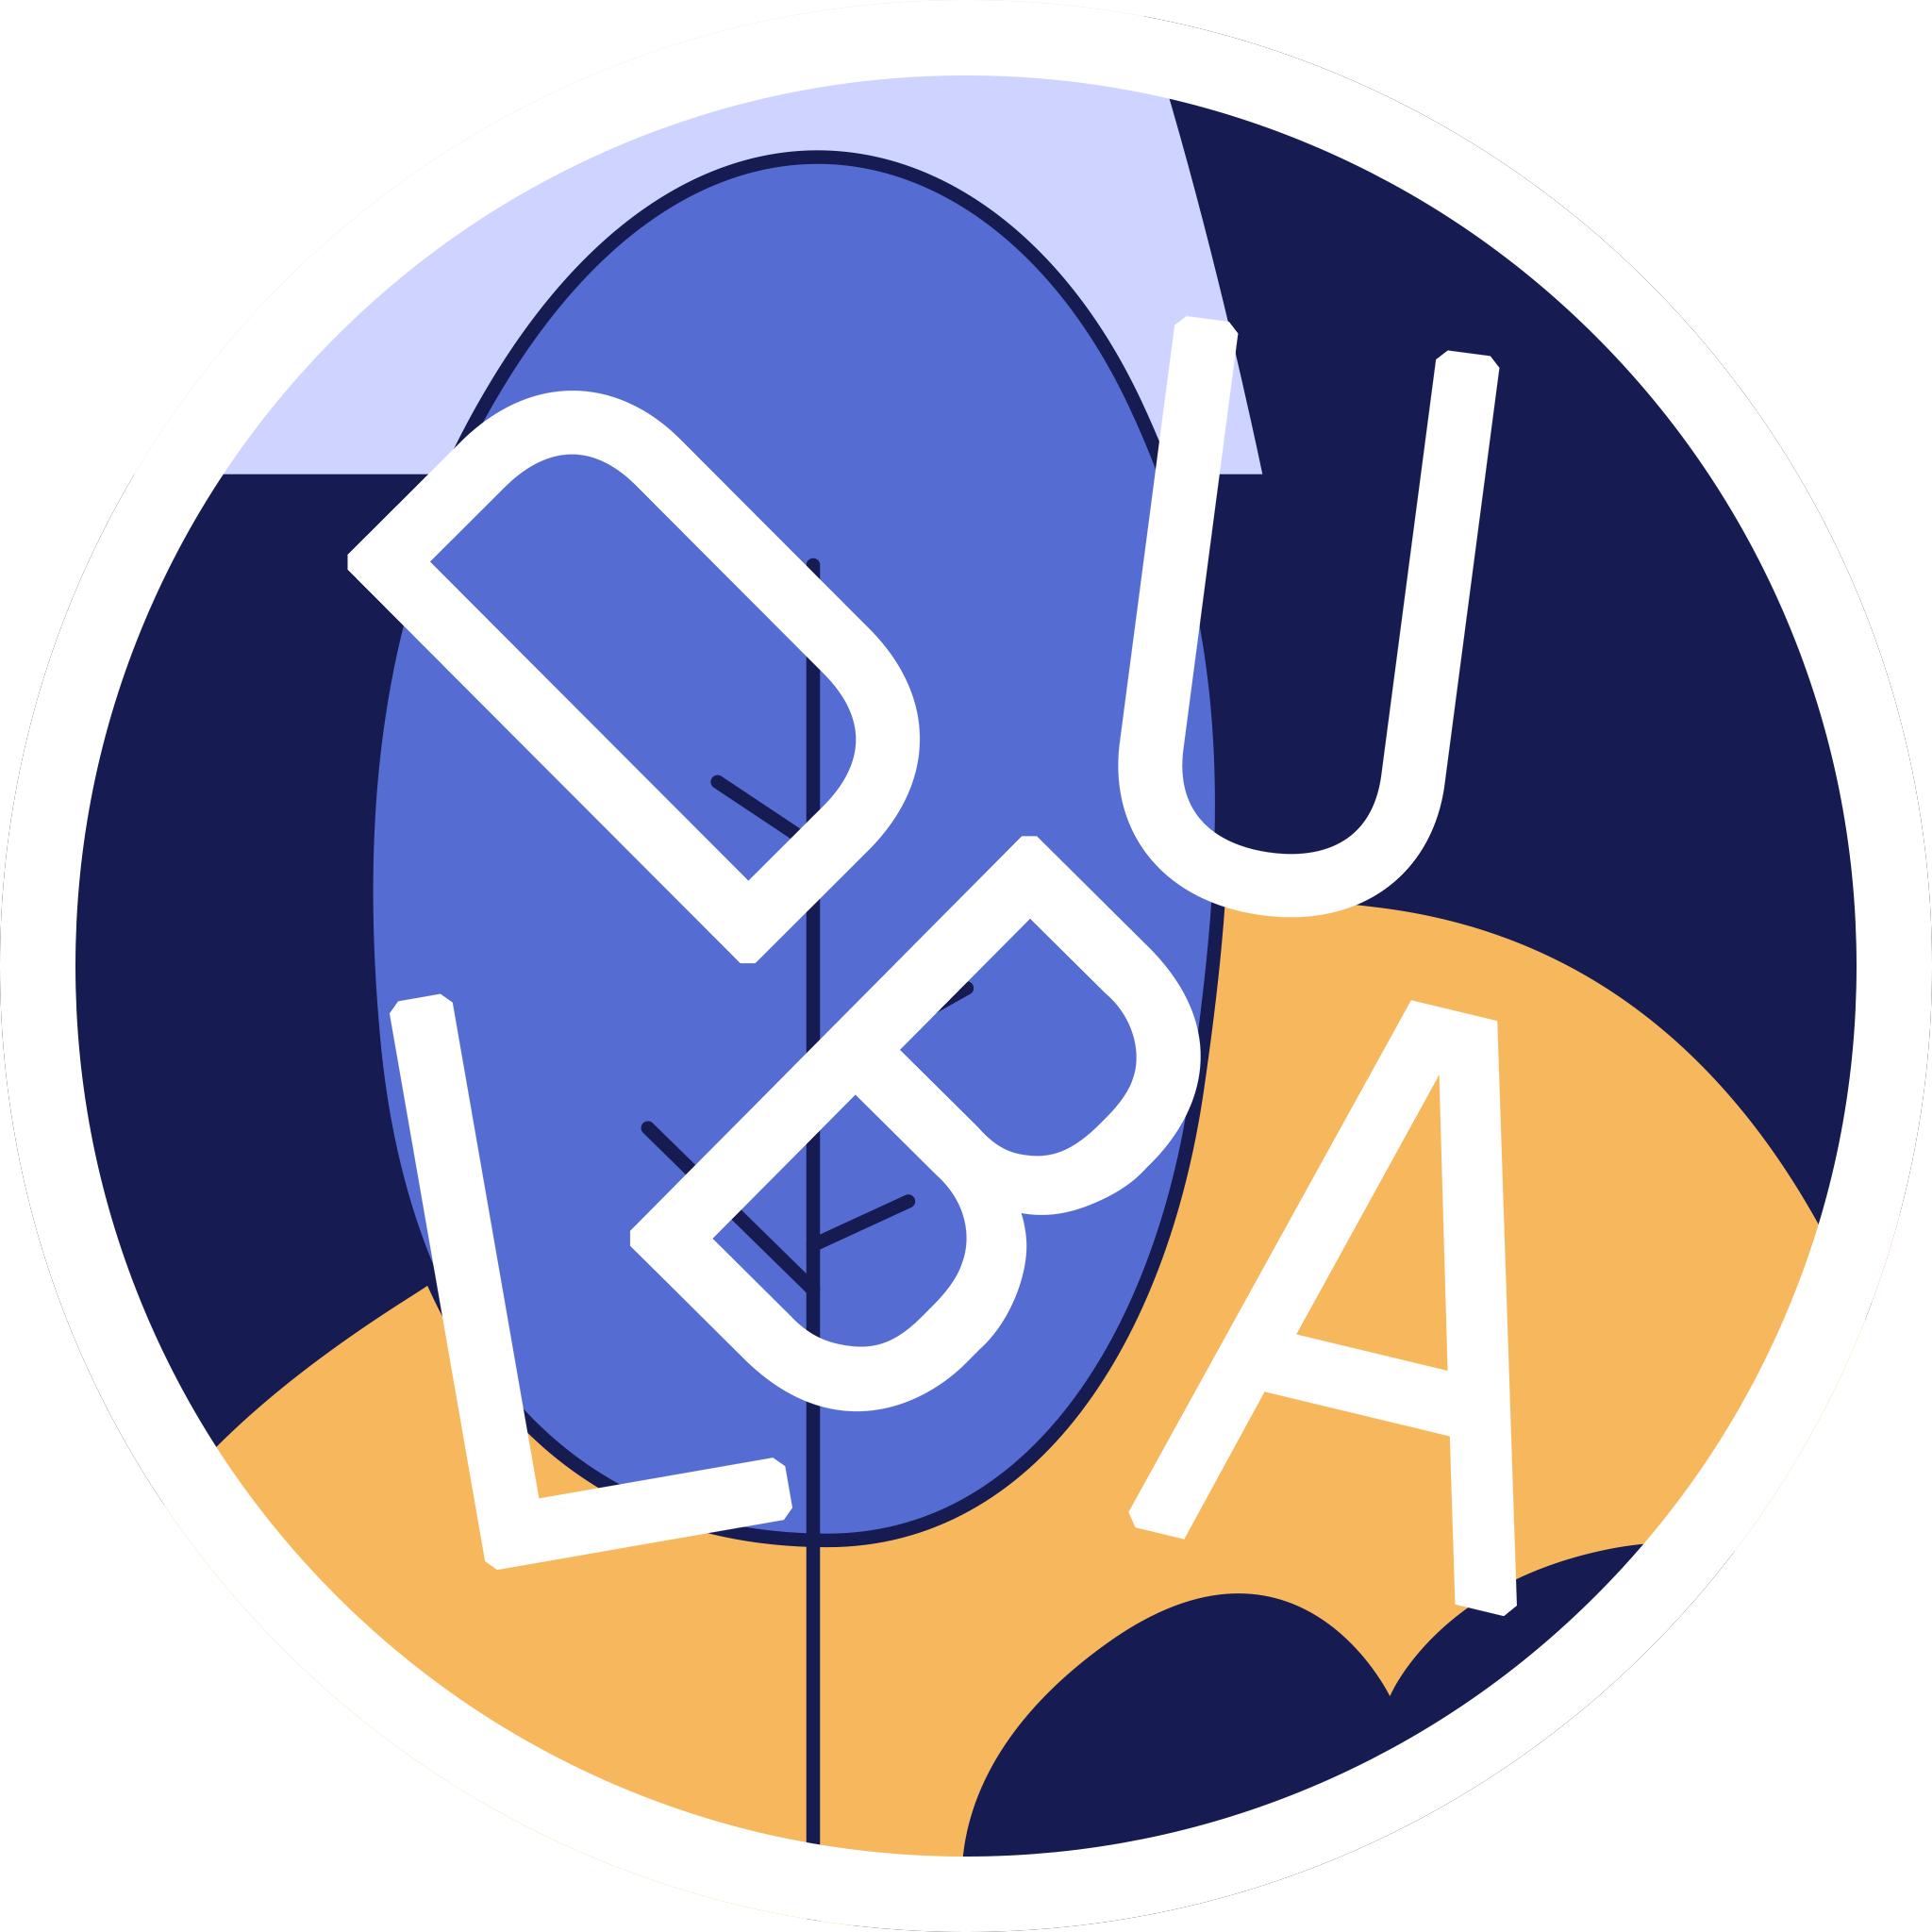 Dubla Events: One Of Romania's Best Kept Secrets